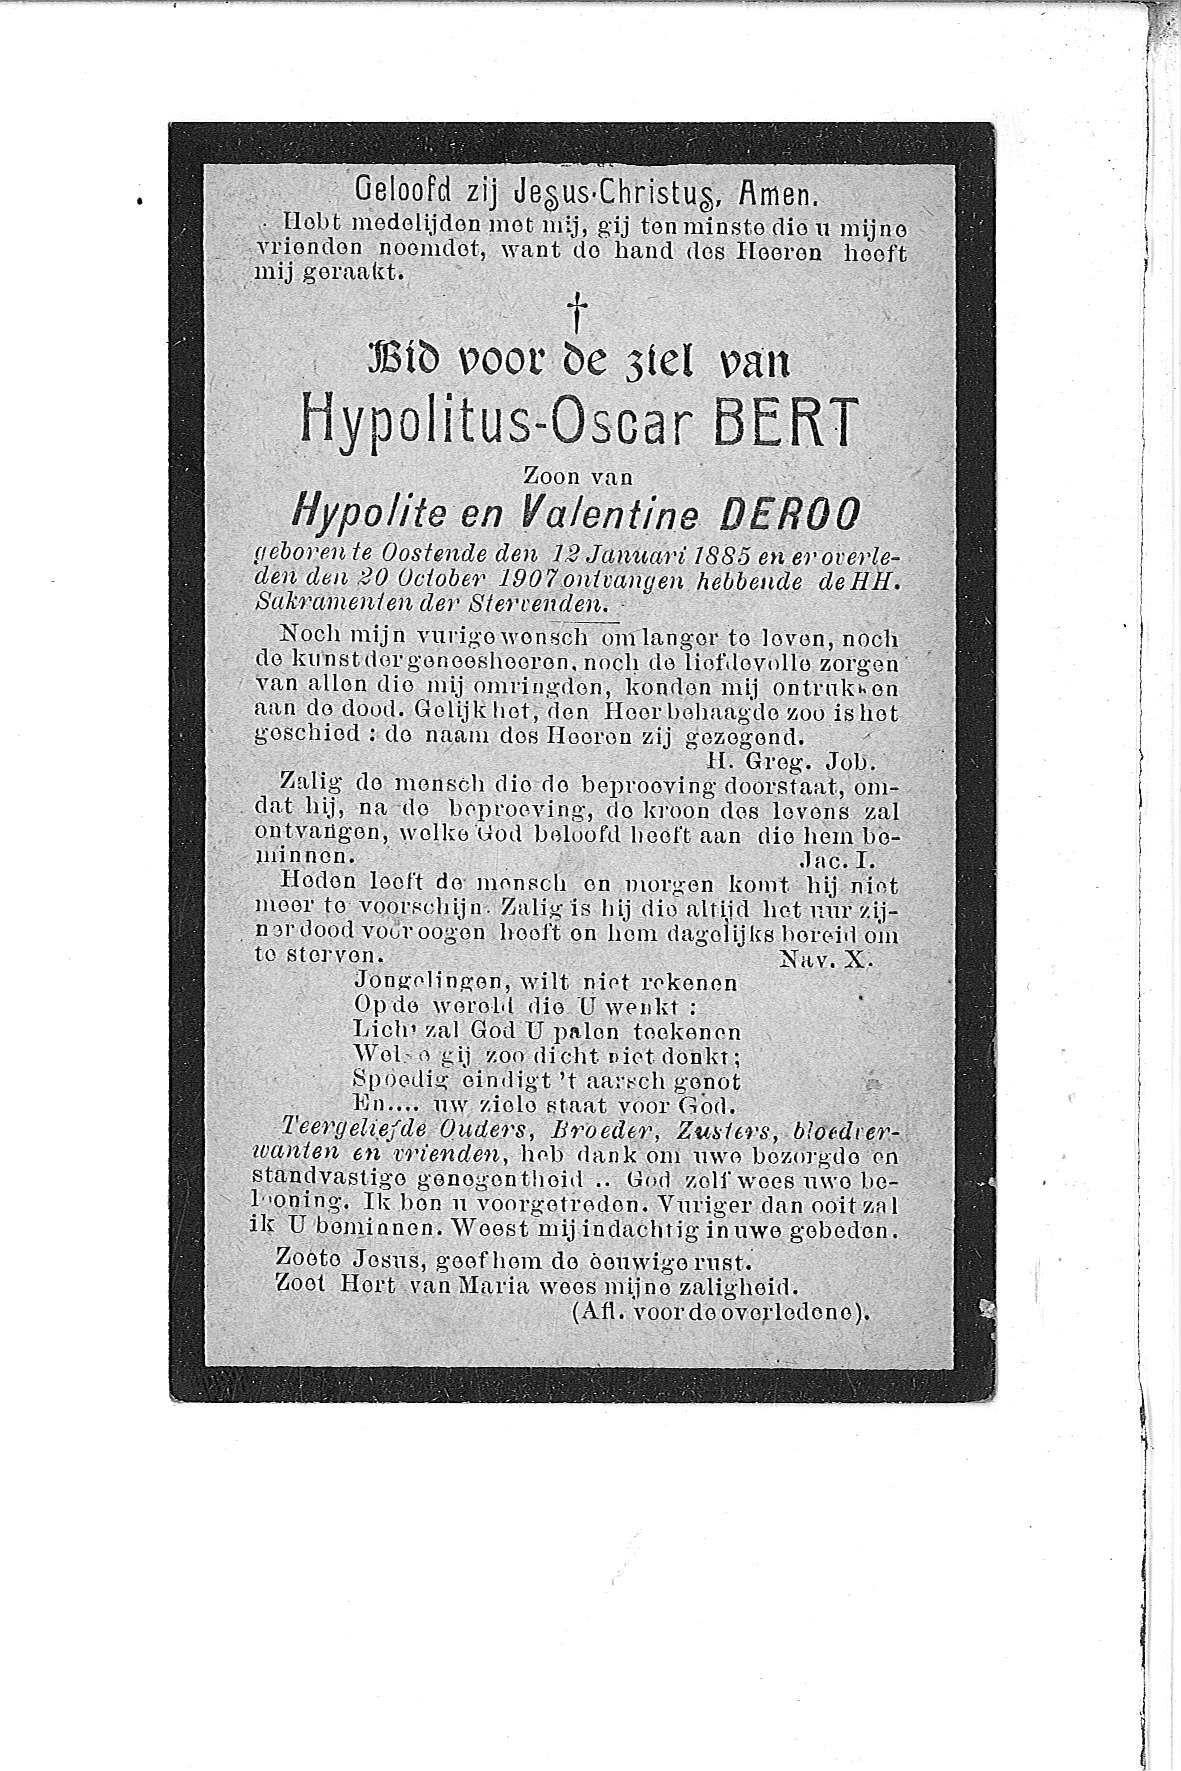 Hypolitus-Oscar(1907)20110131094546_00048.jpg